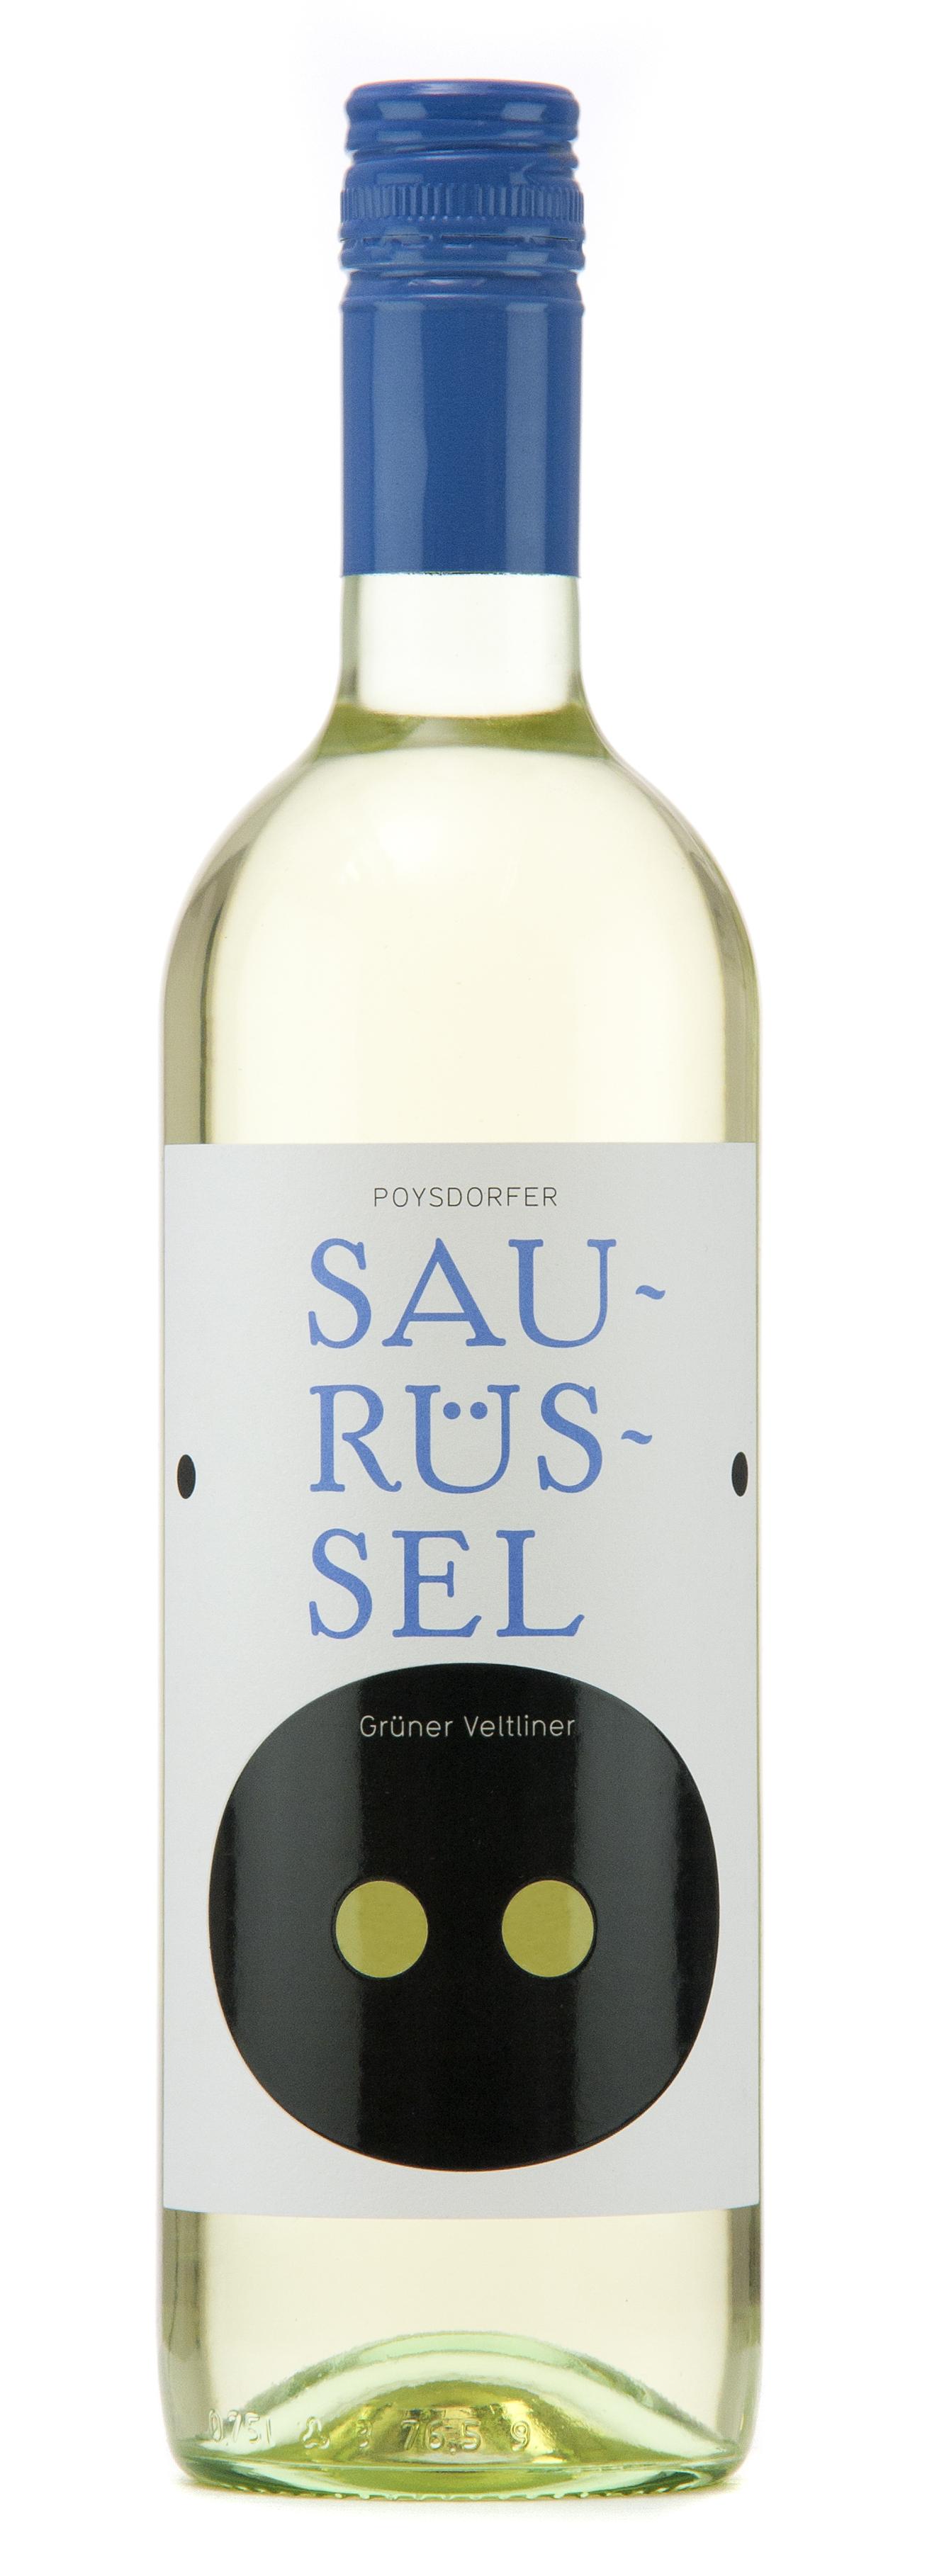 Hugl Wimmer Poysdorfer Saurüssel Grüner Veltliner